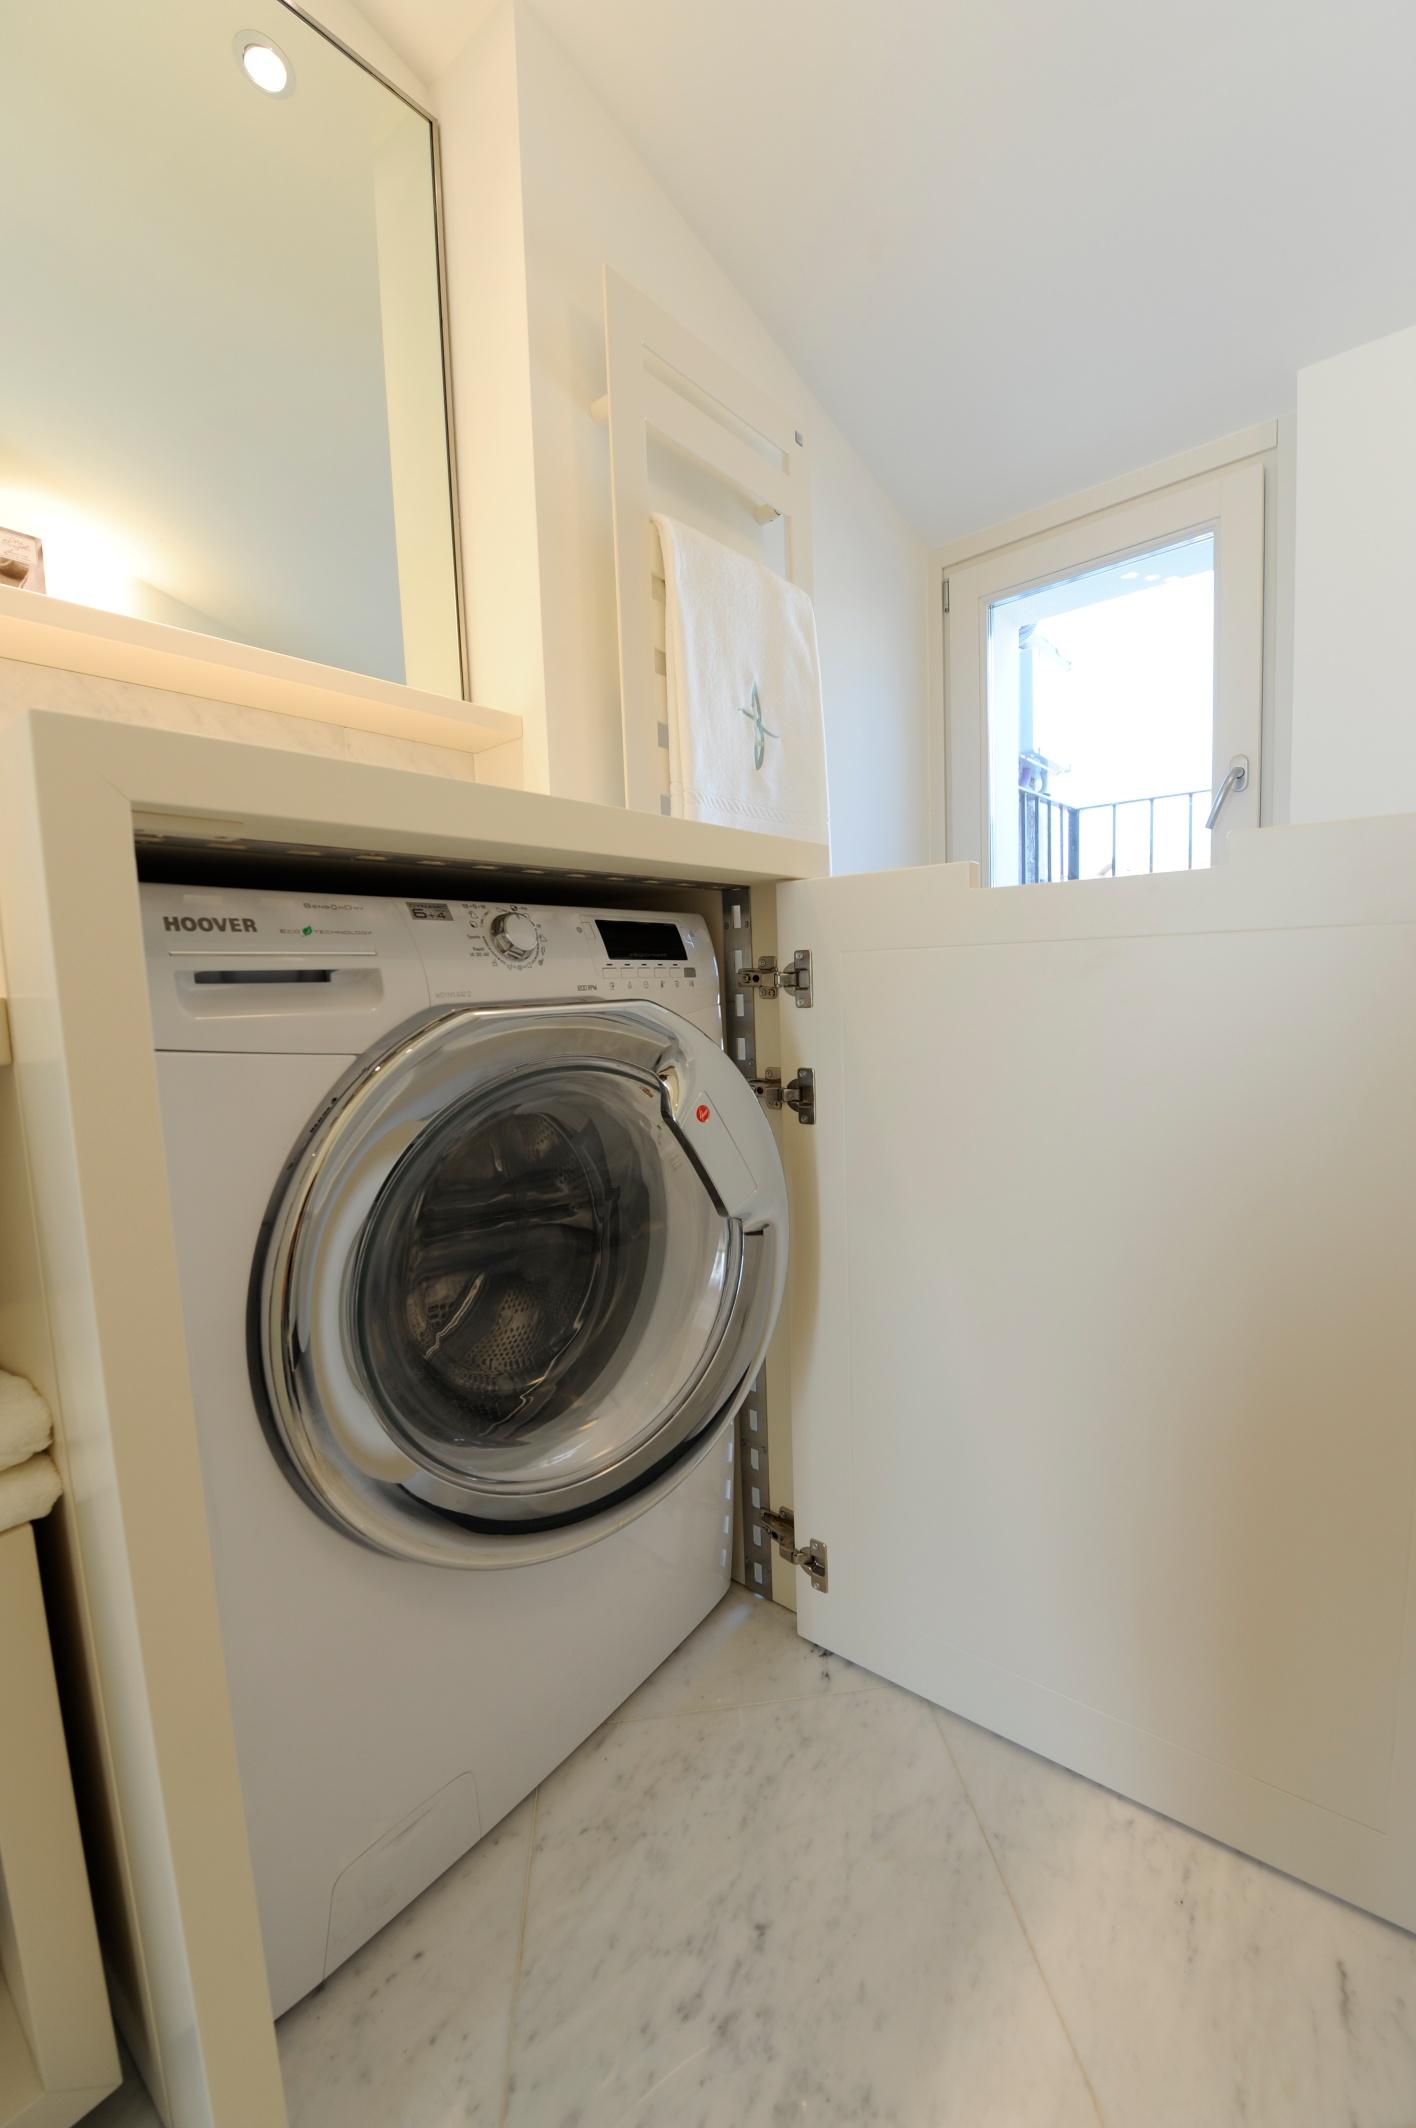 Aparthotel casa vacanze suite boutique hotel iseo - Mobile lavatrice ikea ...